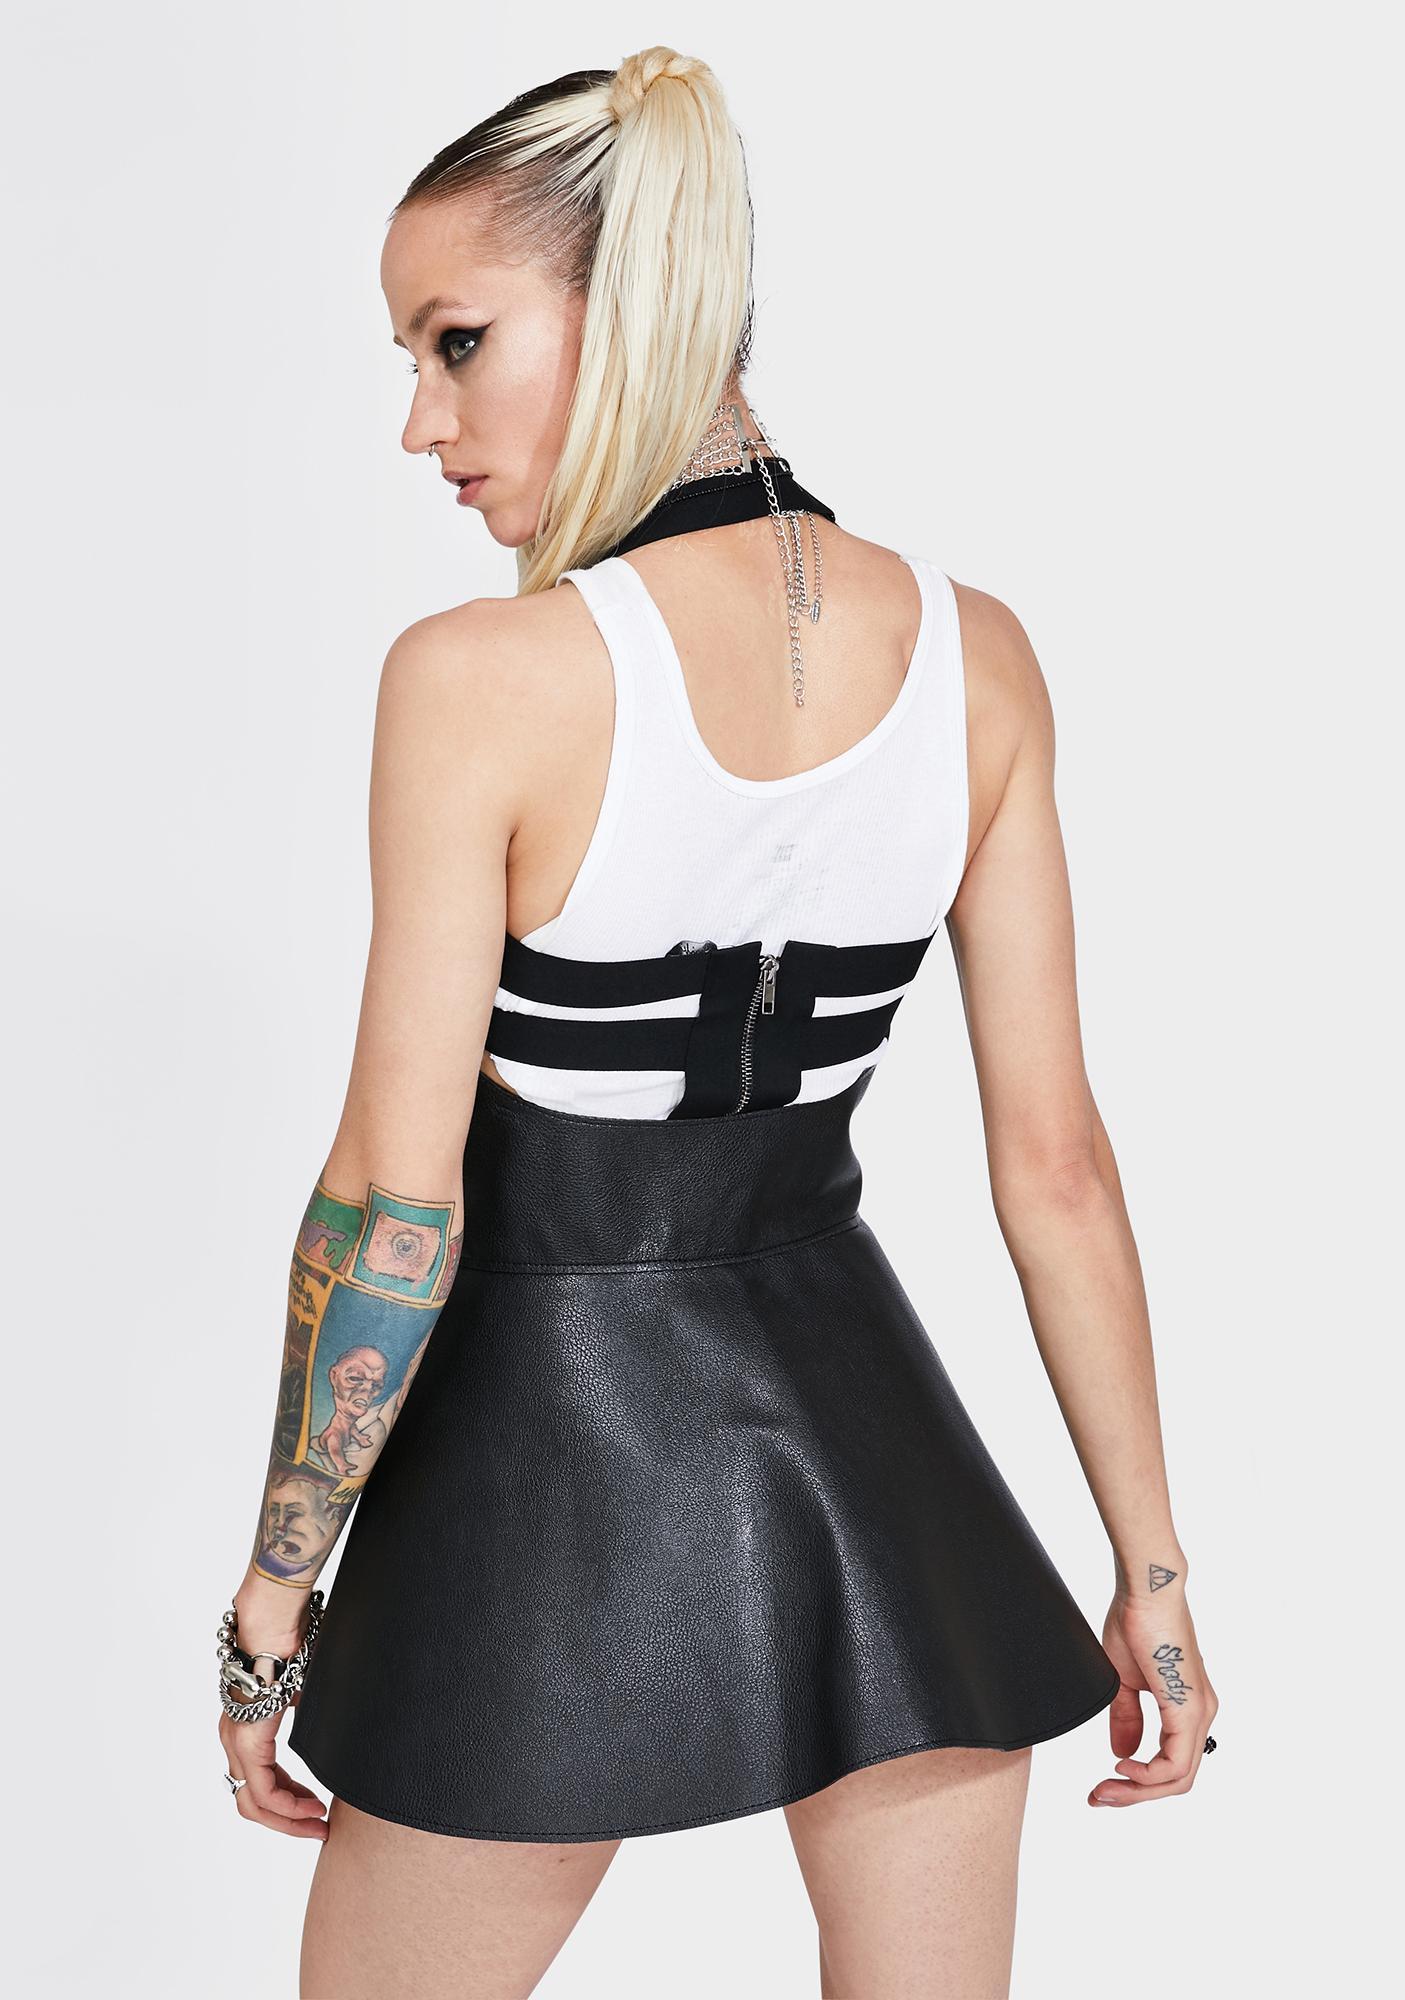 Kiki Riki Never Satisfied Mini Skirt Belt